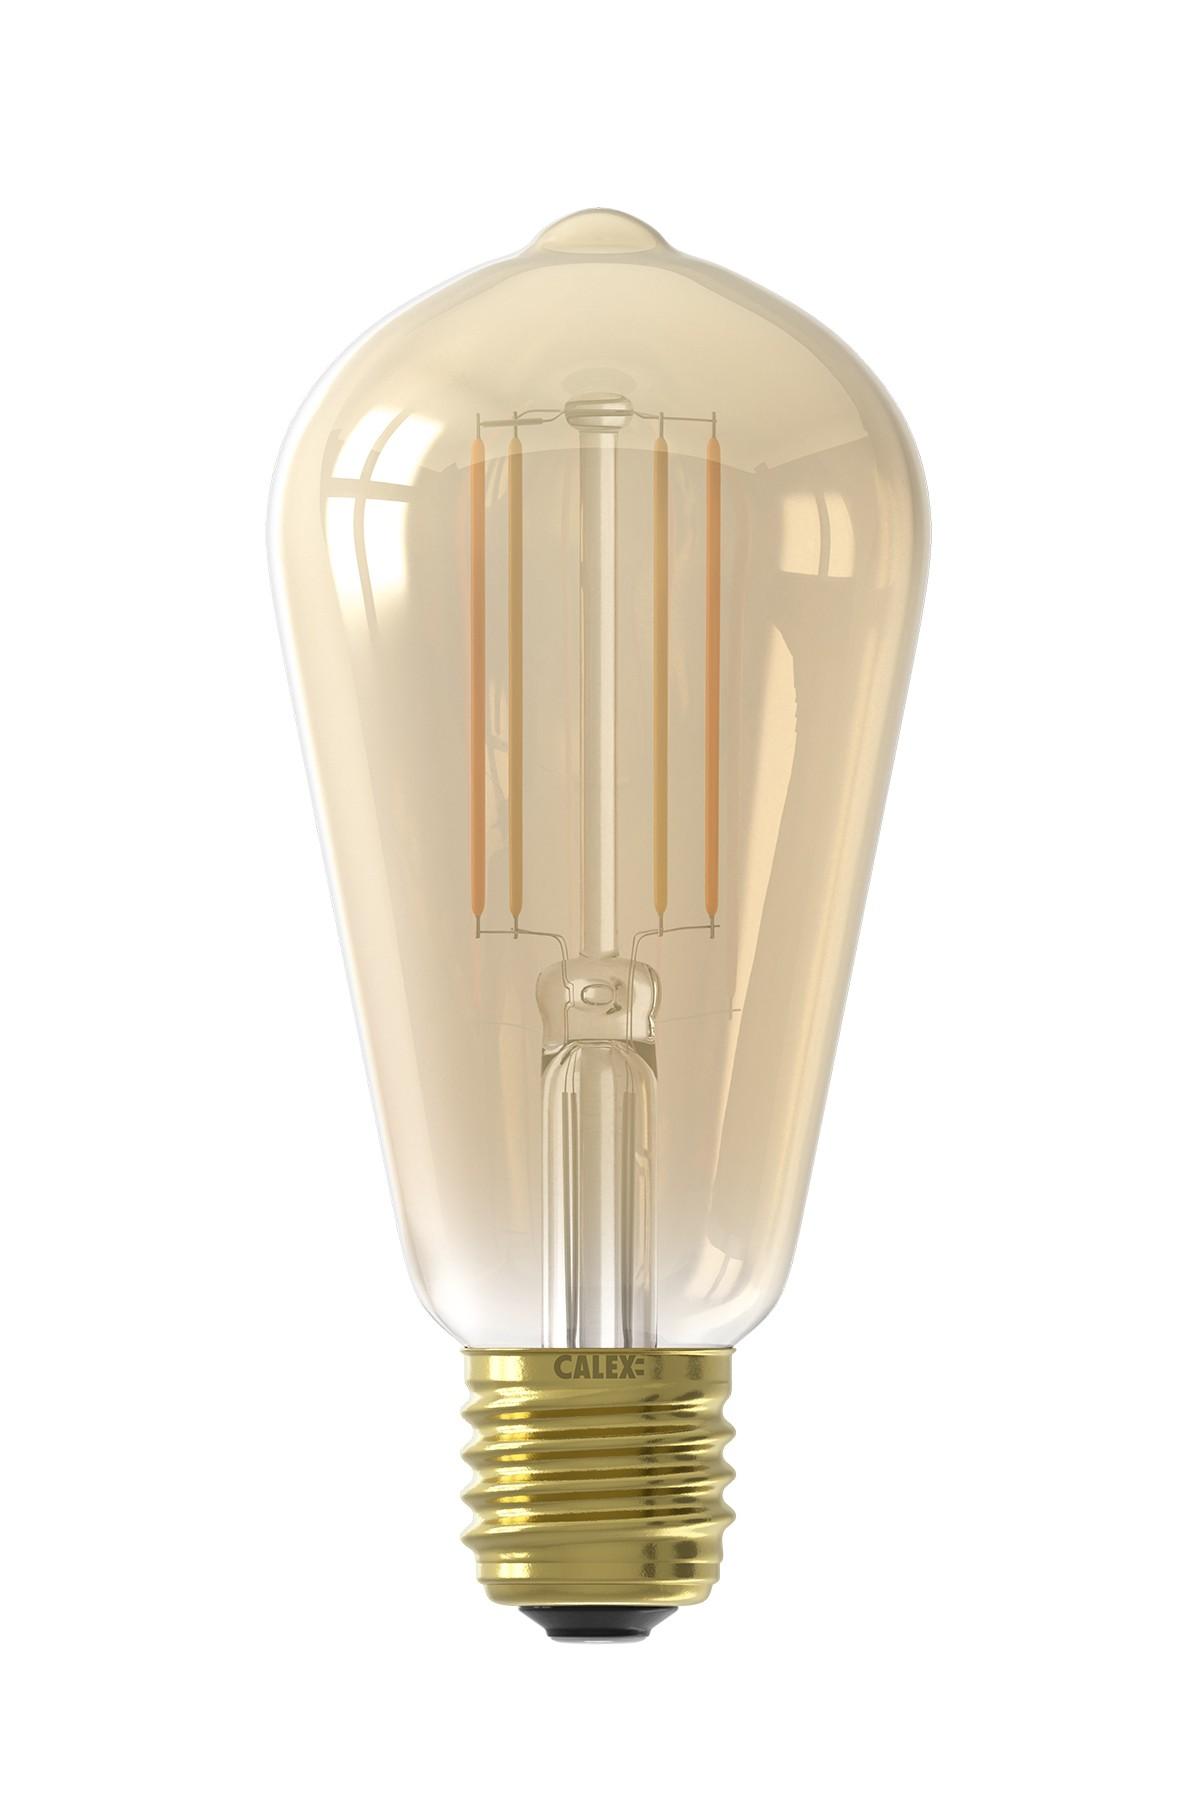 Calex Smart Rustiek led lamp 7W 806lm 1800-3000K